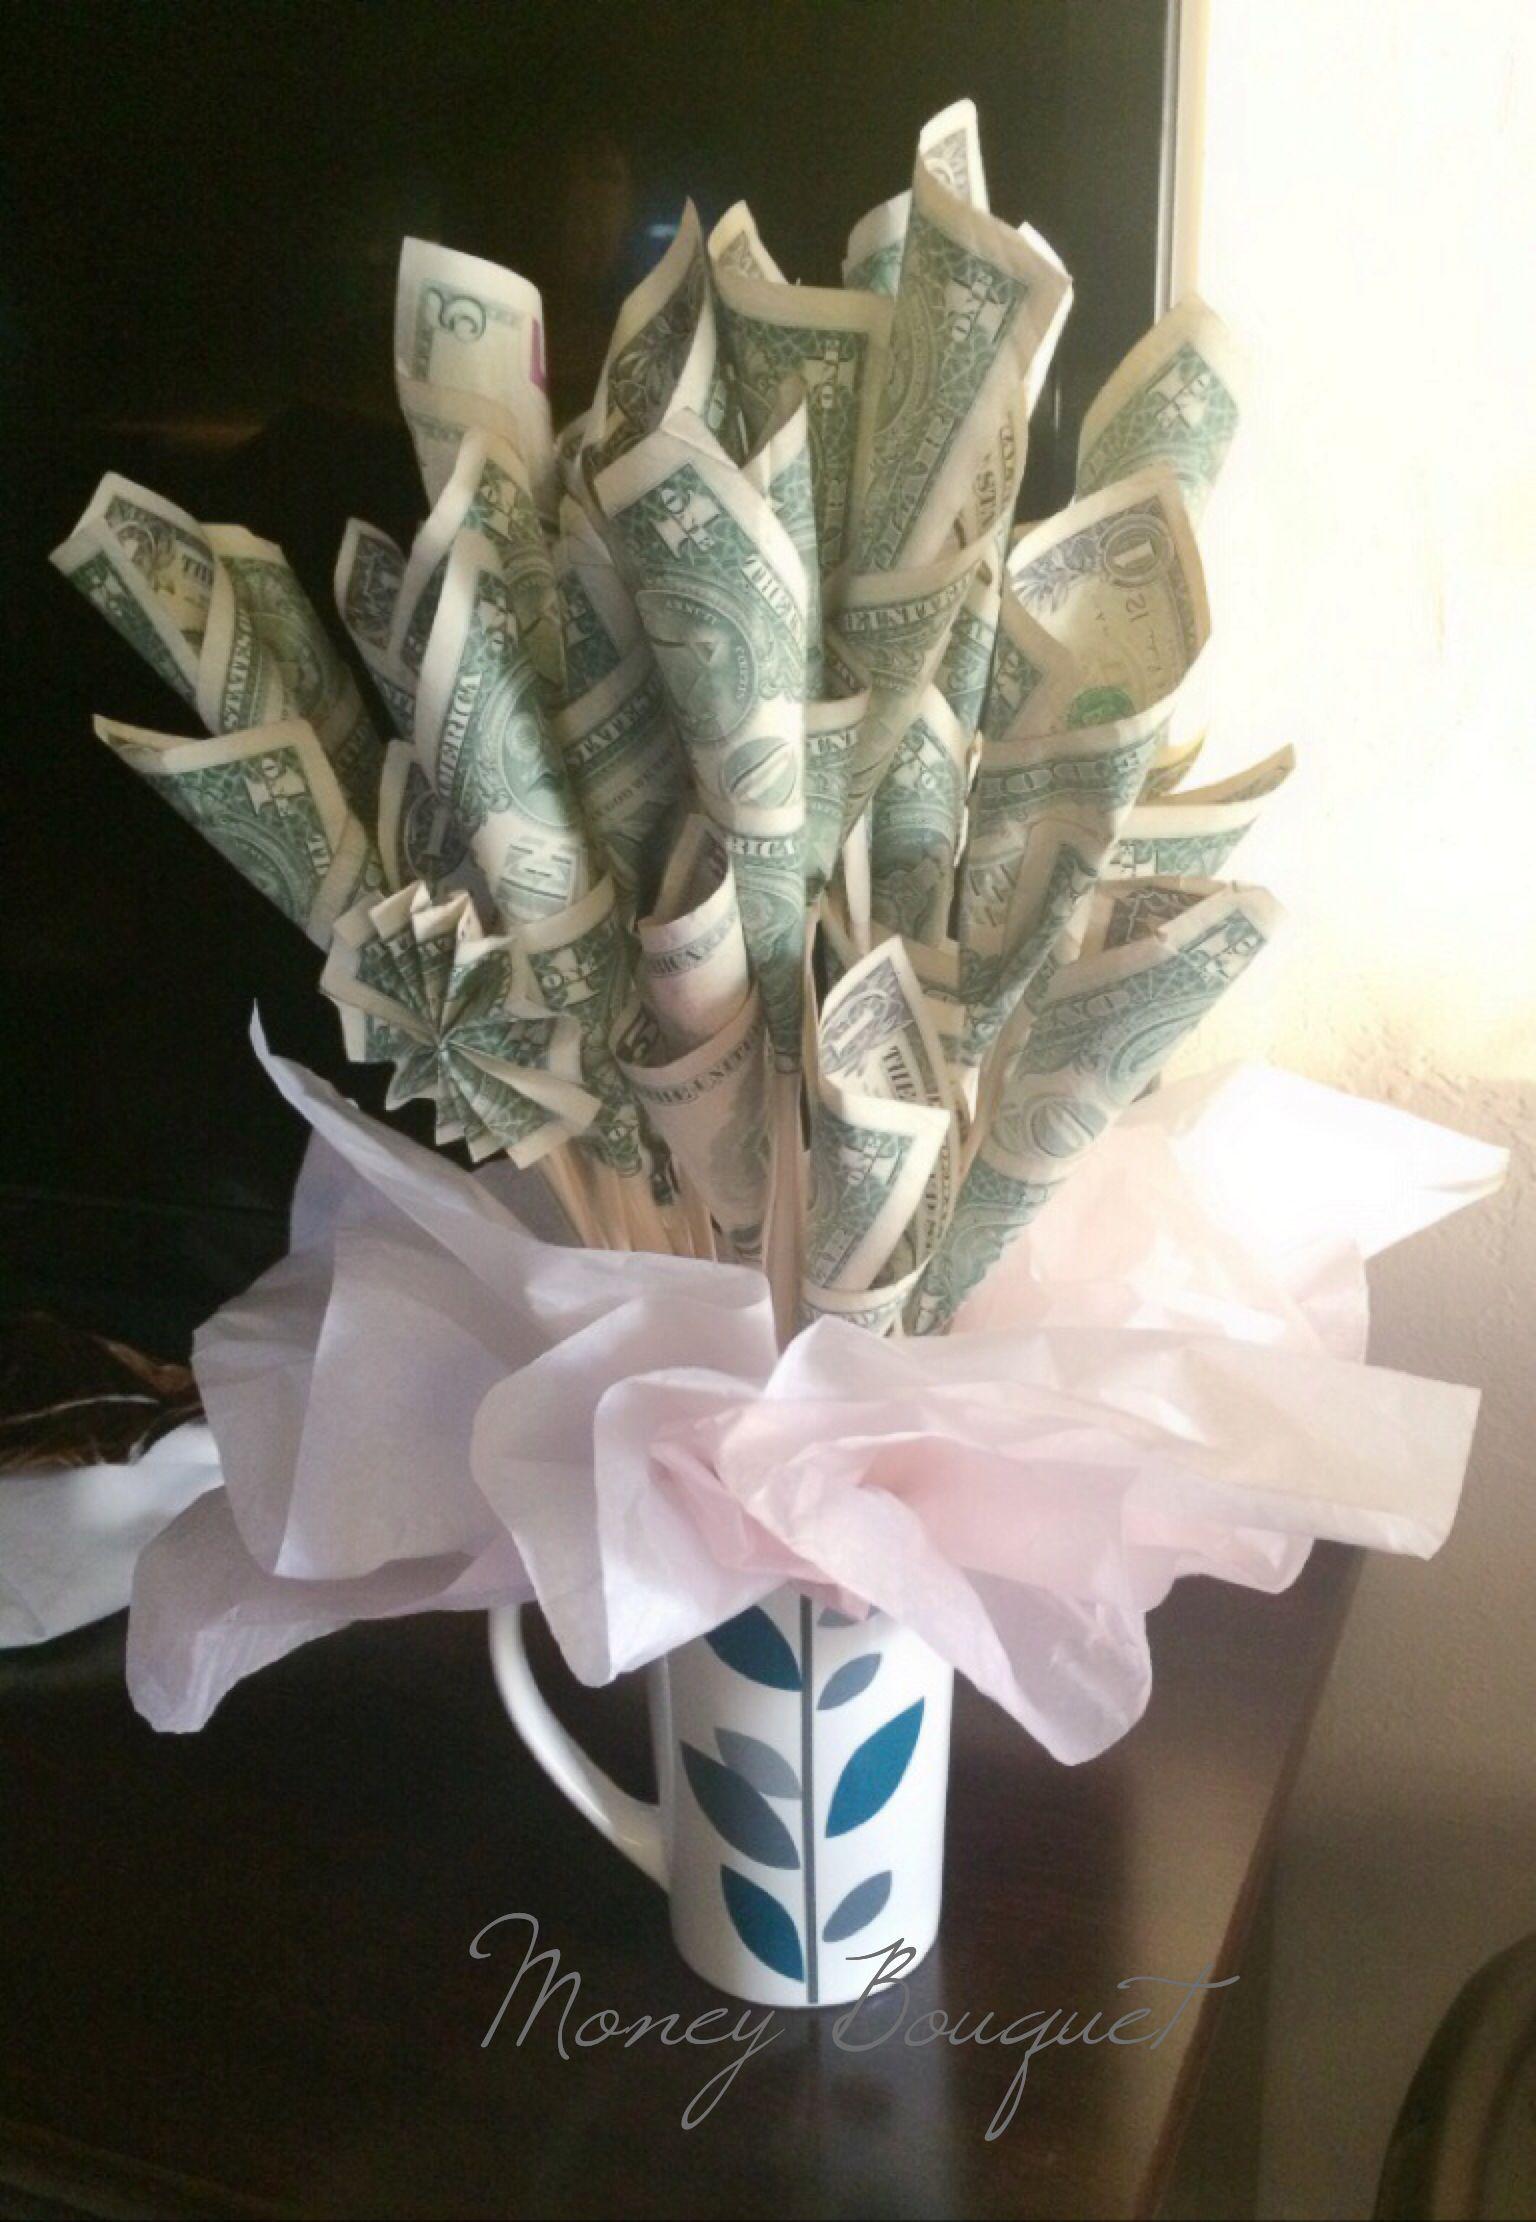 Money bouquet | My creative side | Pinterest | Money trees ...